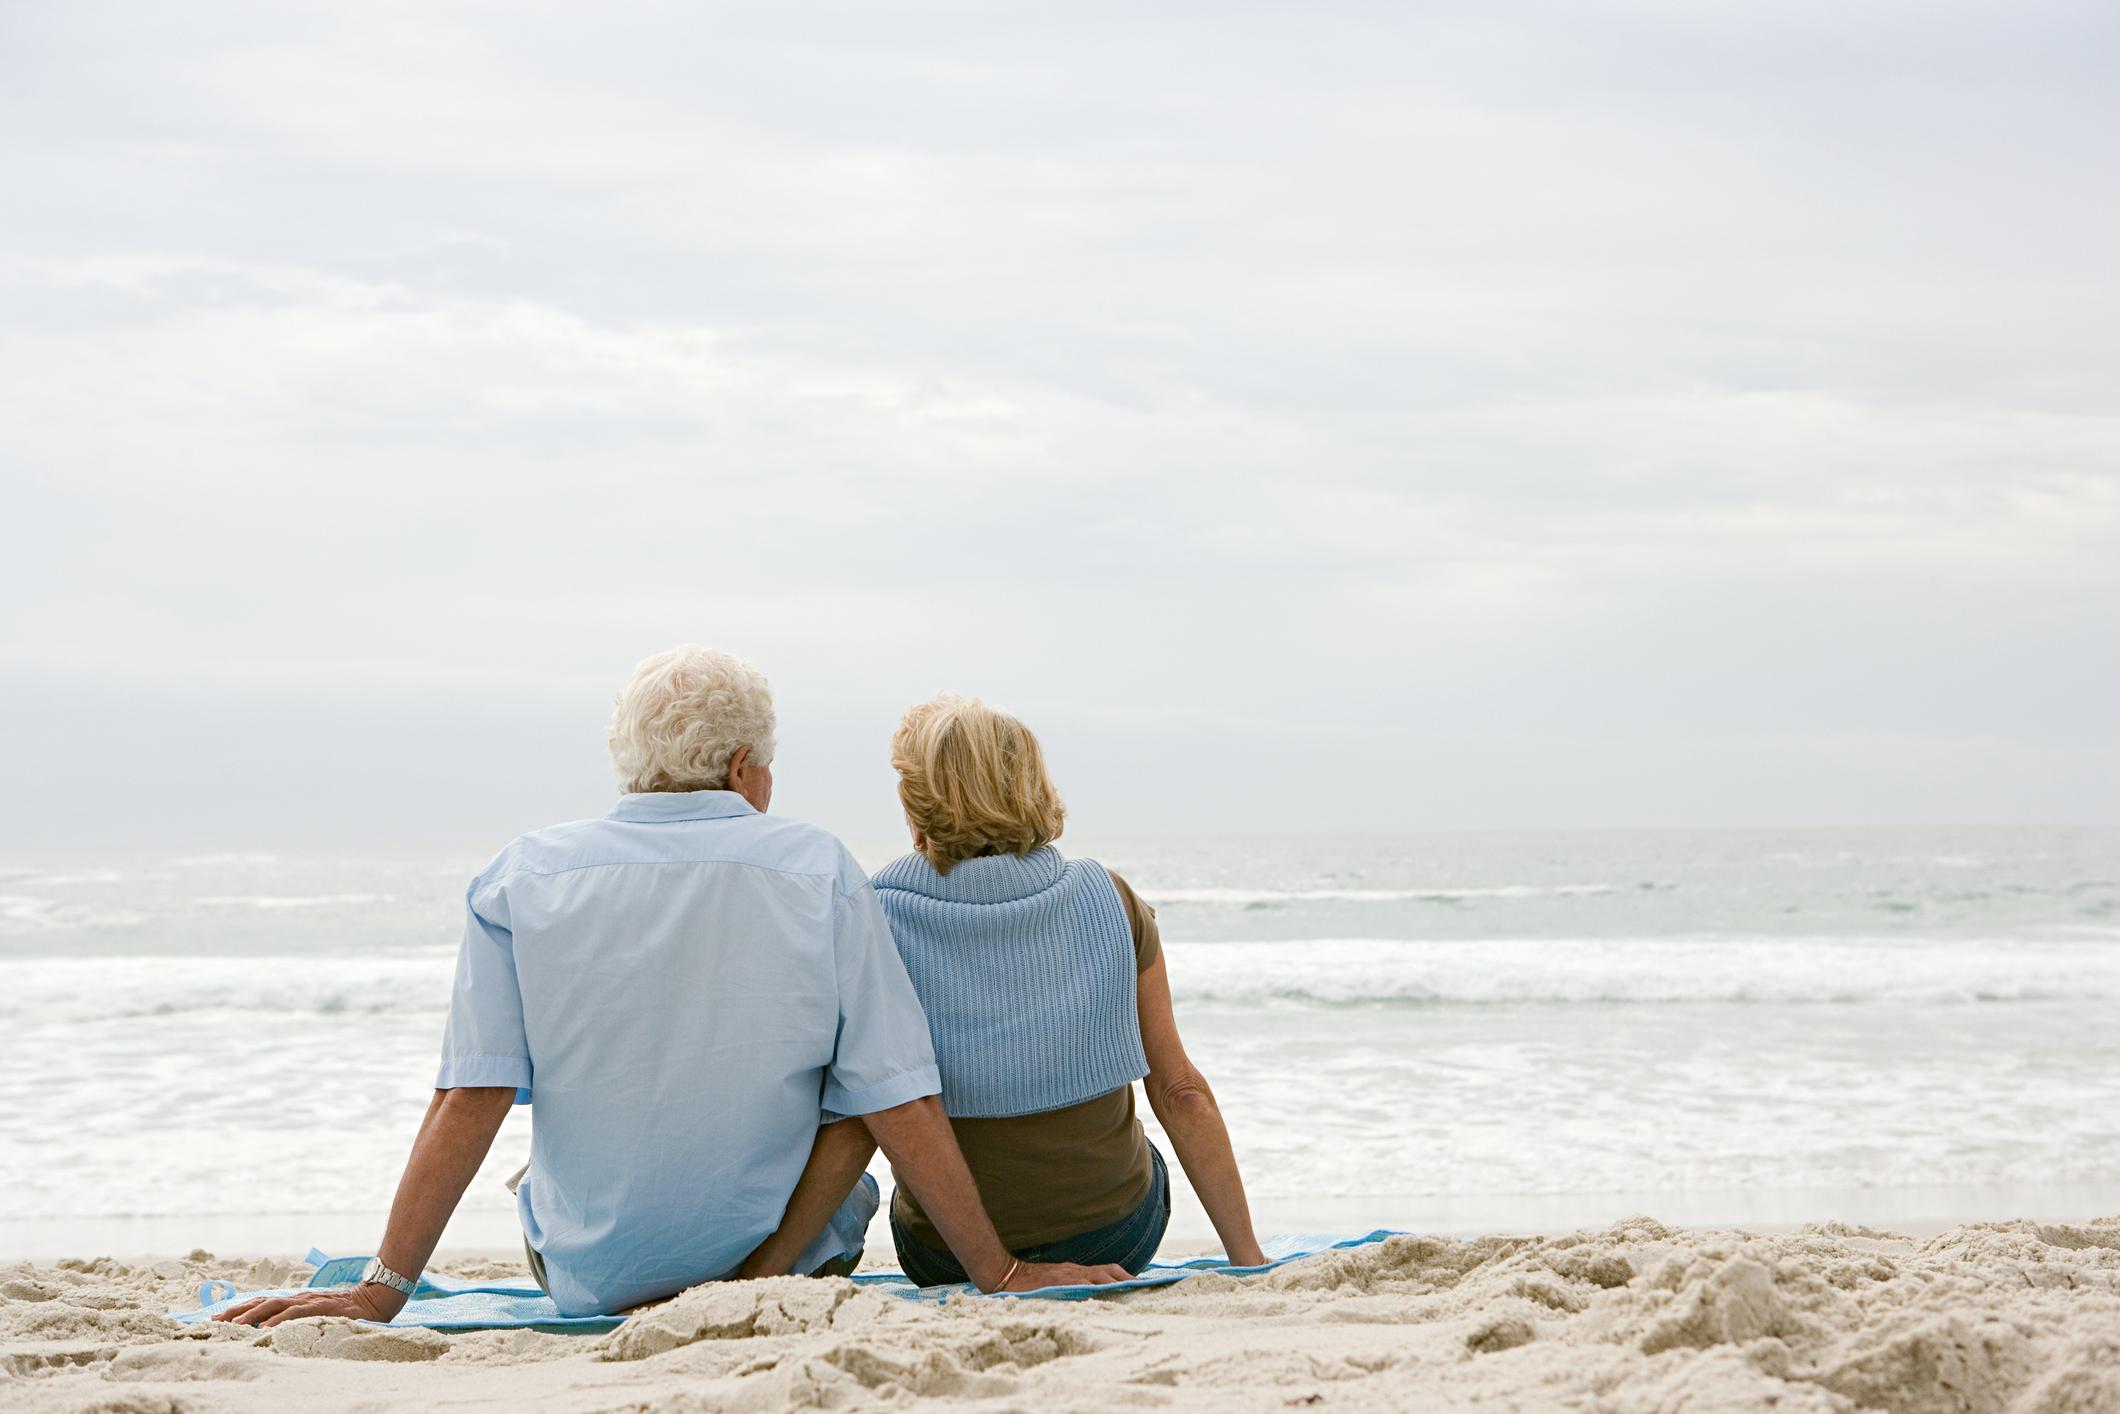 A senior couple relaxes on a beach